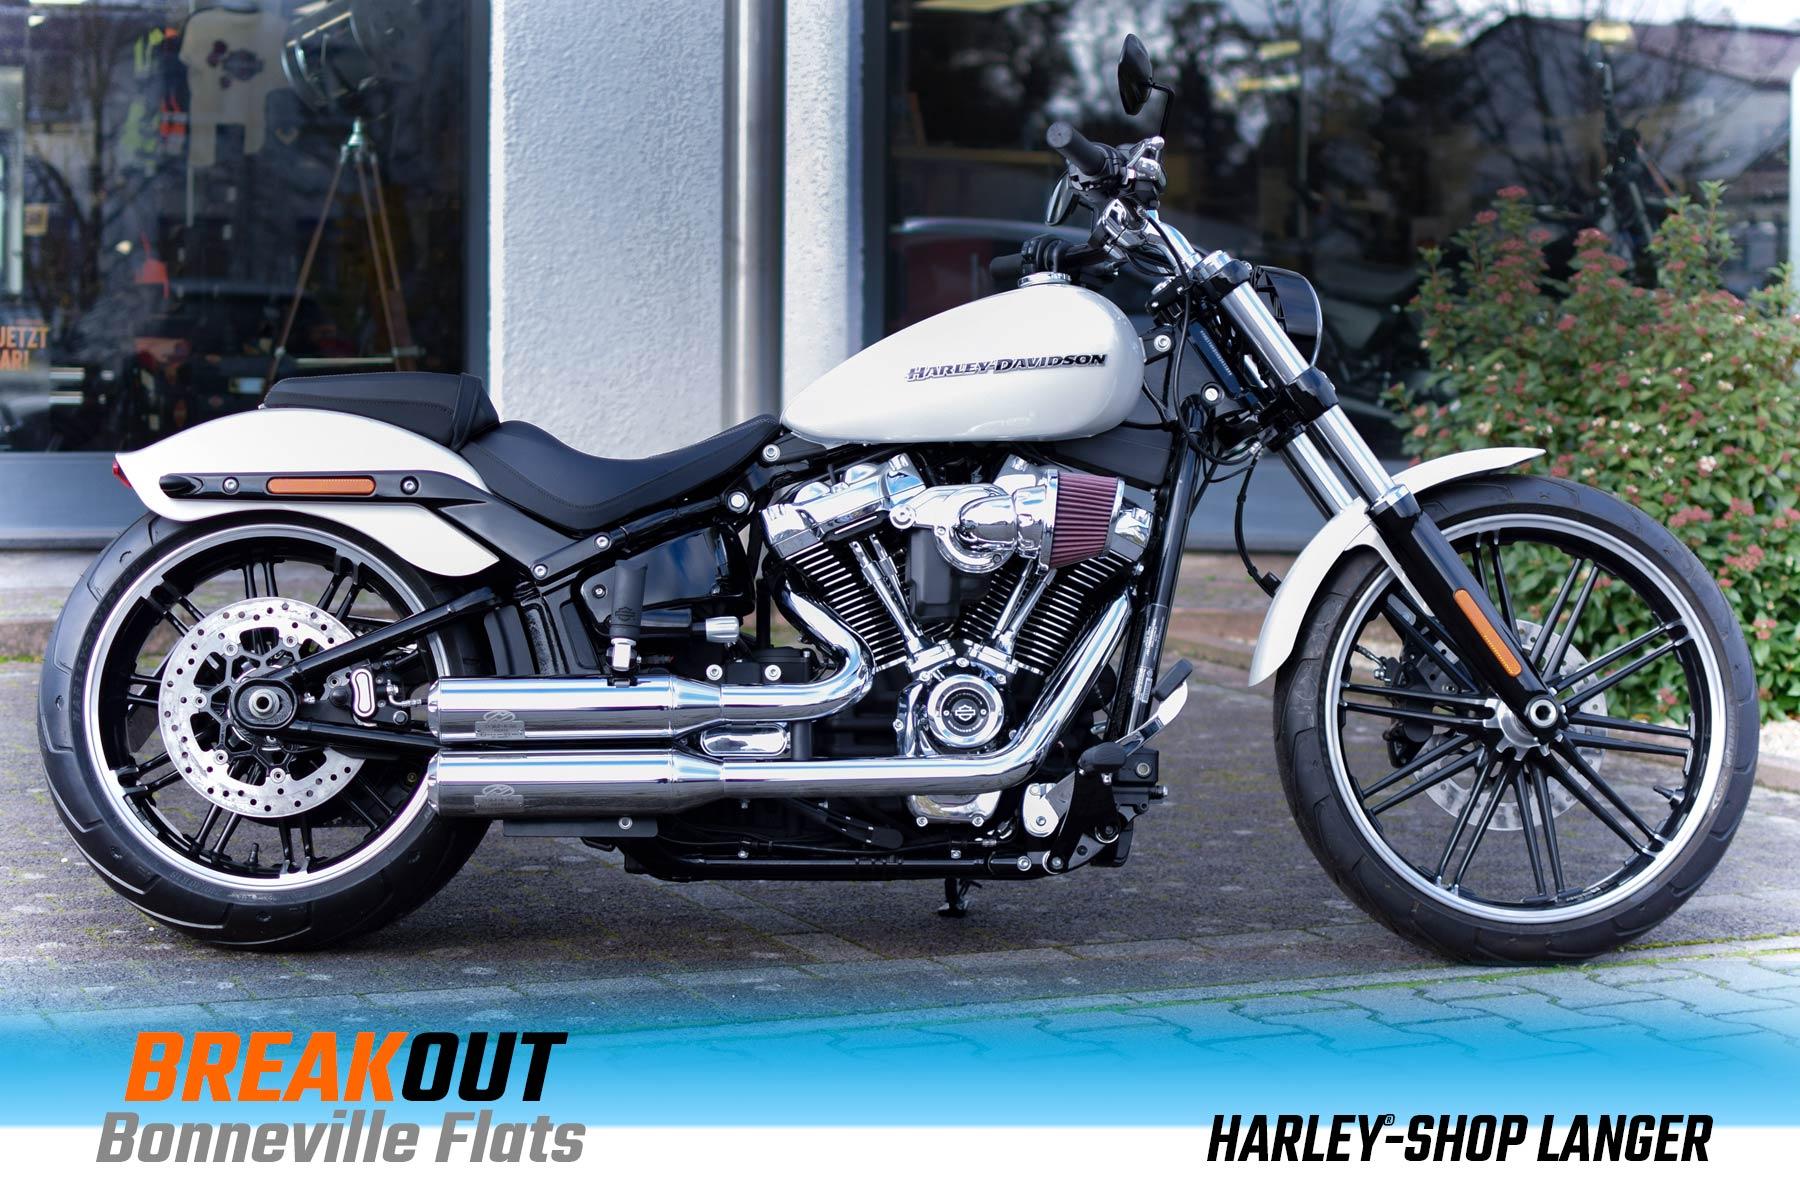 Harley-Shop Langer Breakout Umbau Bonneville Flats Custombike